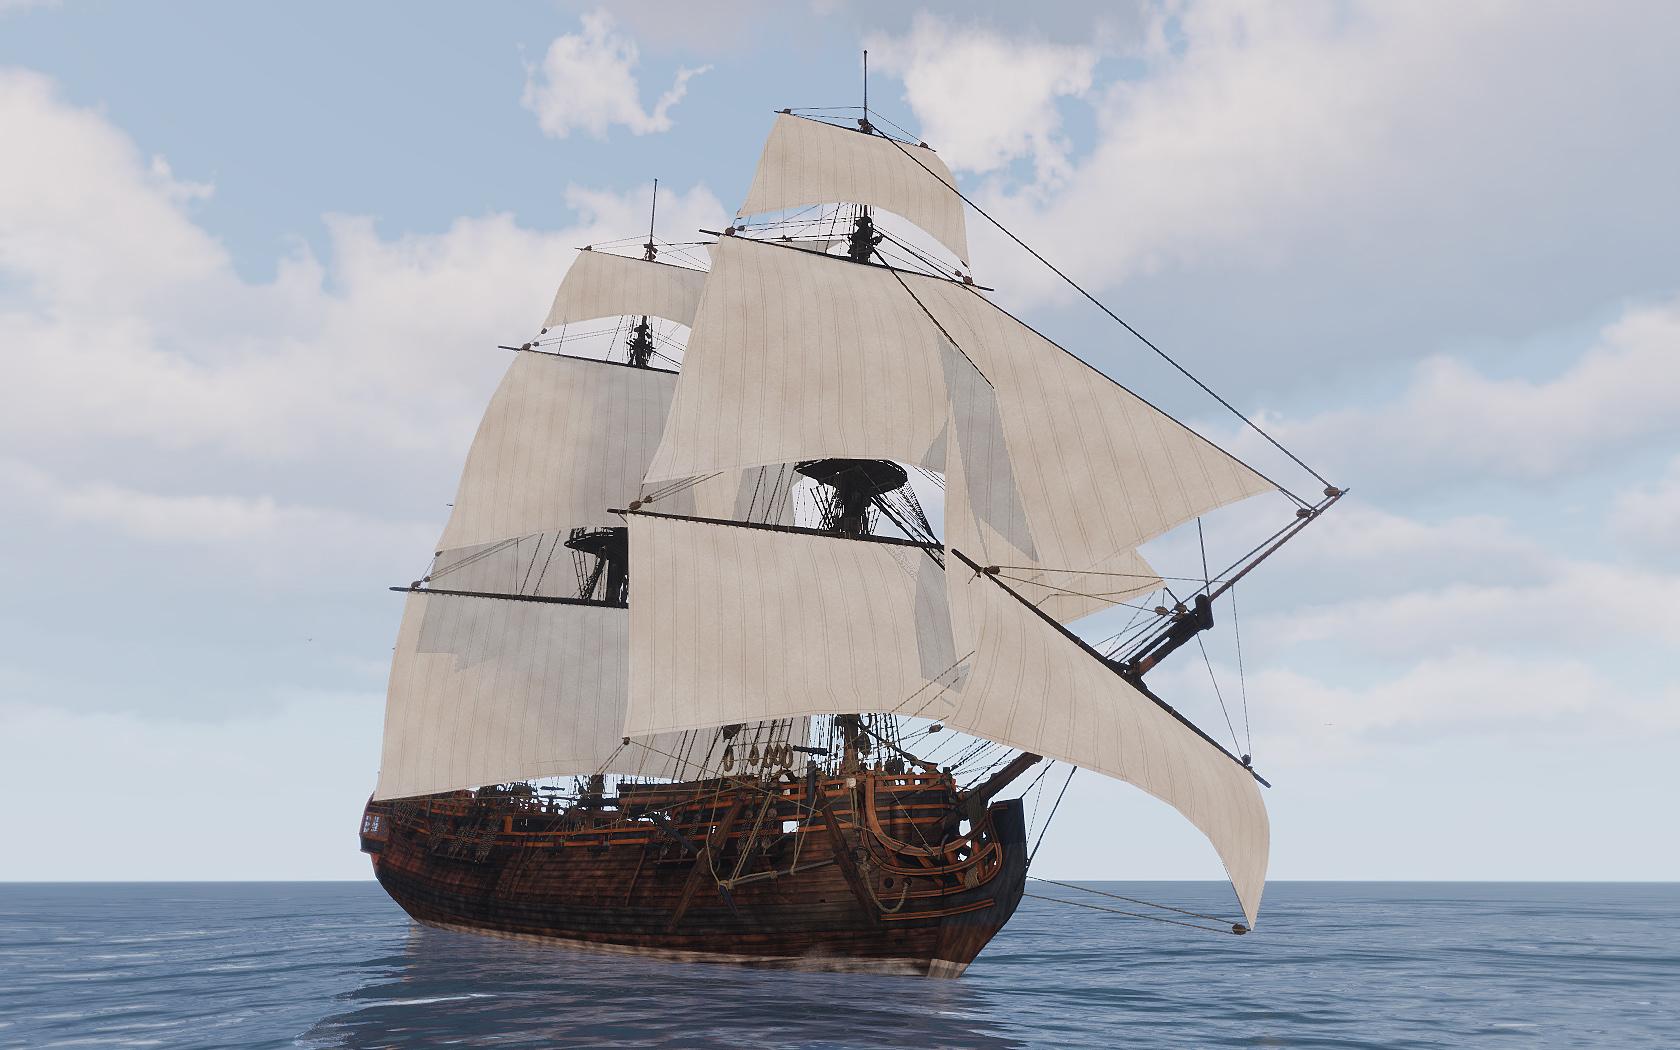 1715_ship1.jpg